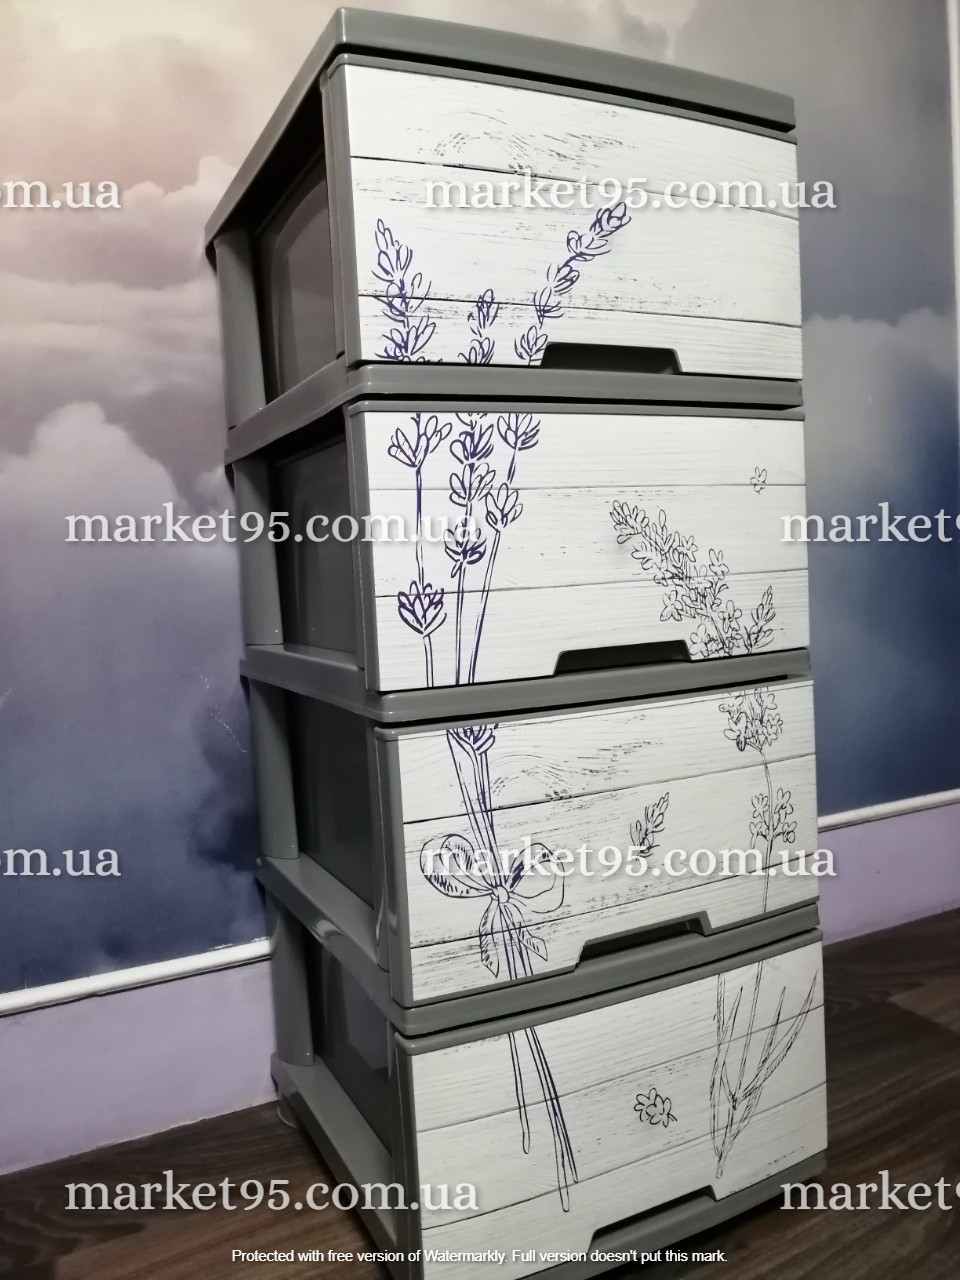 Комод пластиковый Алеана Лаванда 4 полки Темно-серый